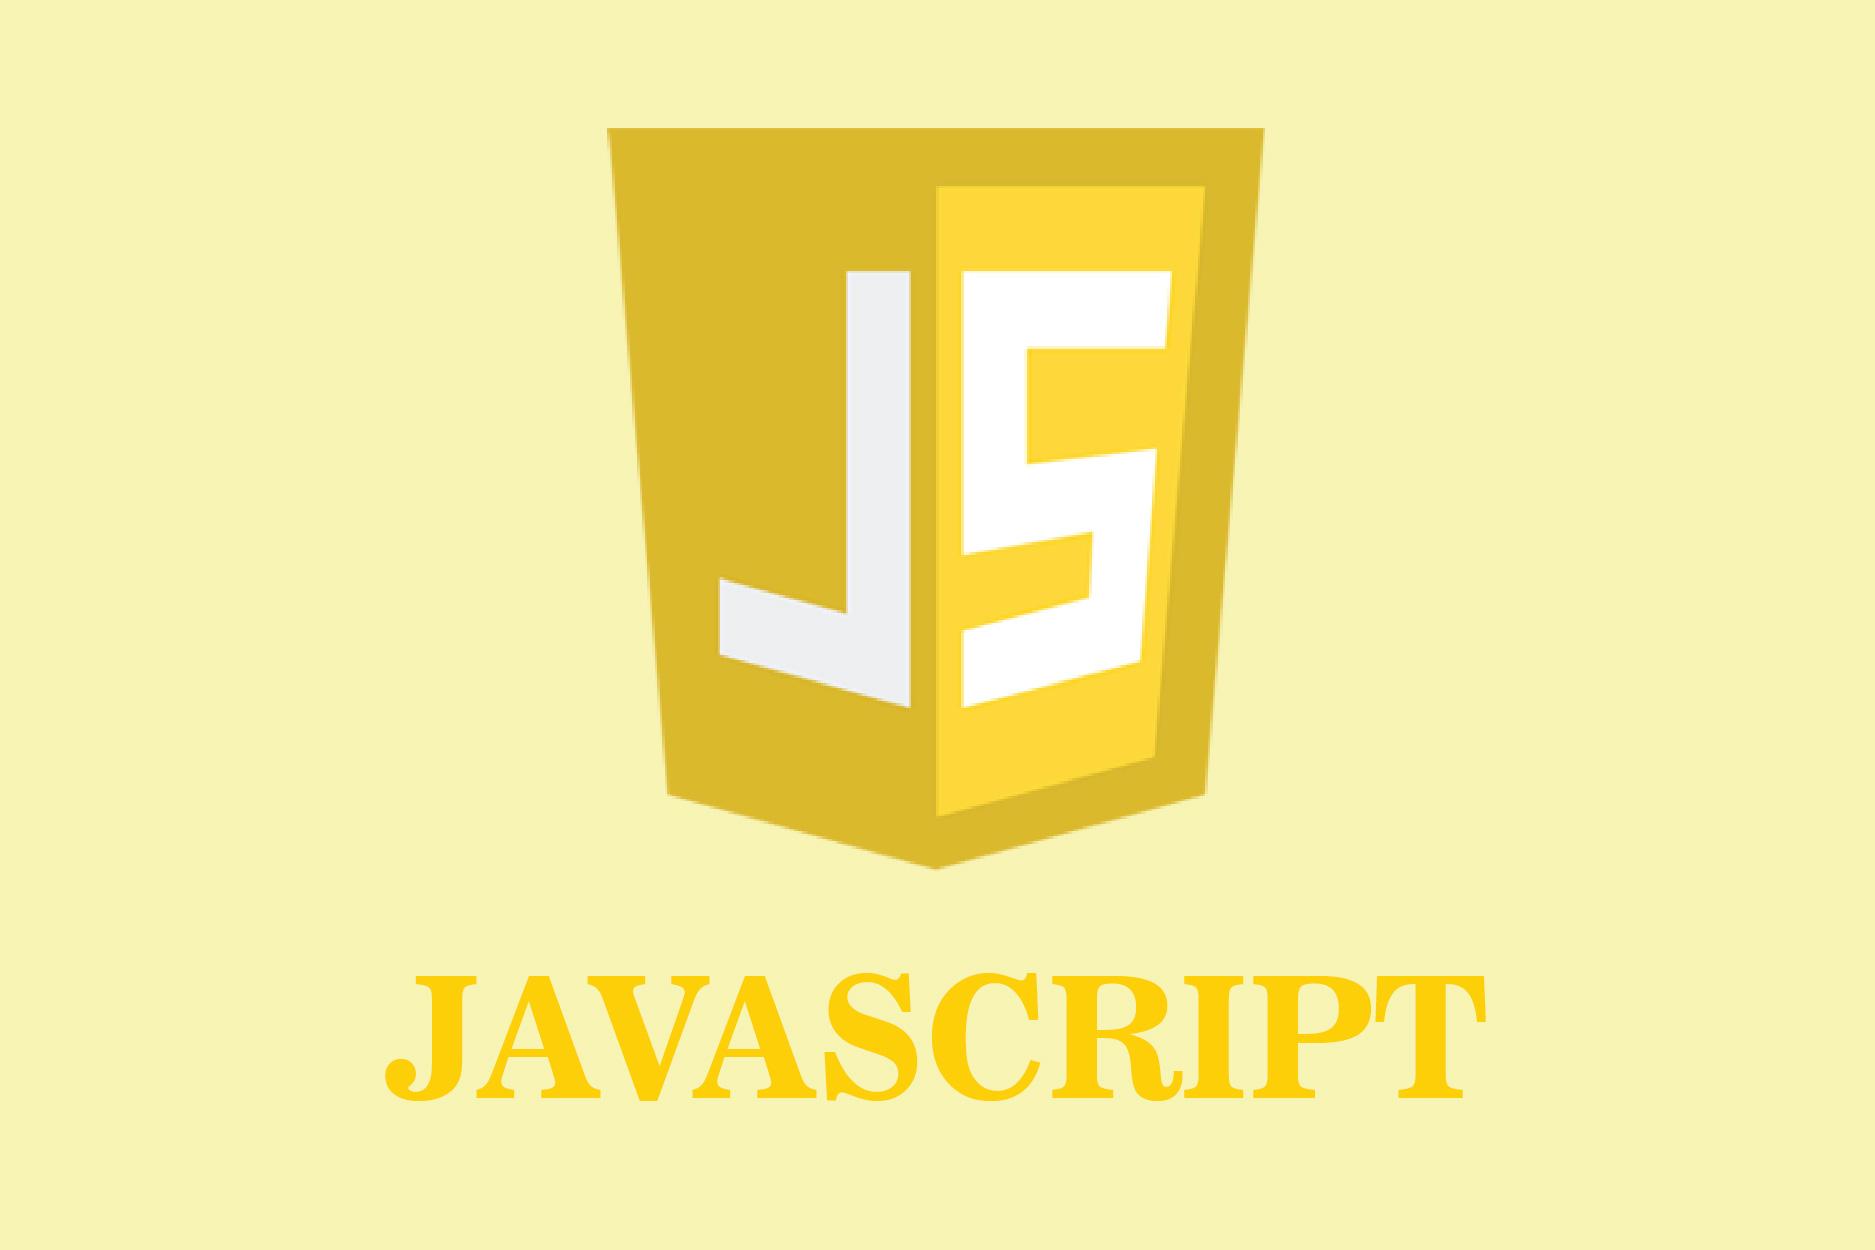 javascript, popular programing language, most popular programming language of 2021, learn javascript